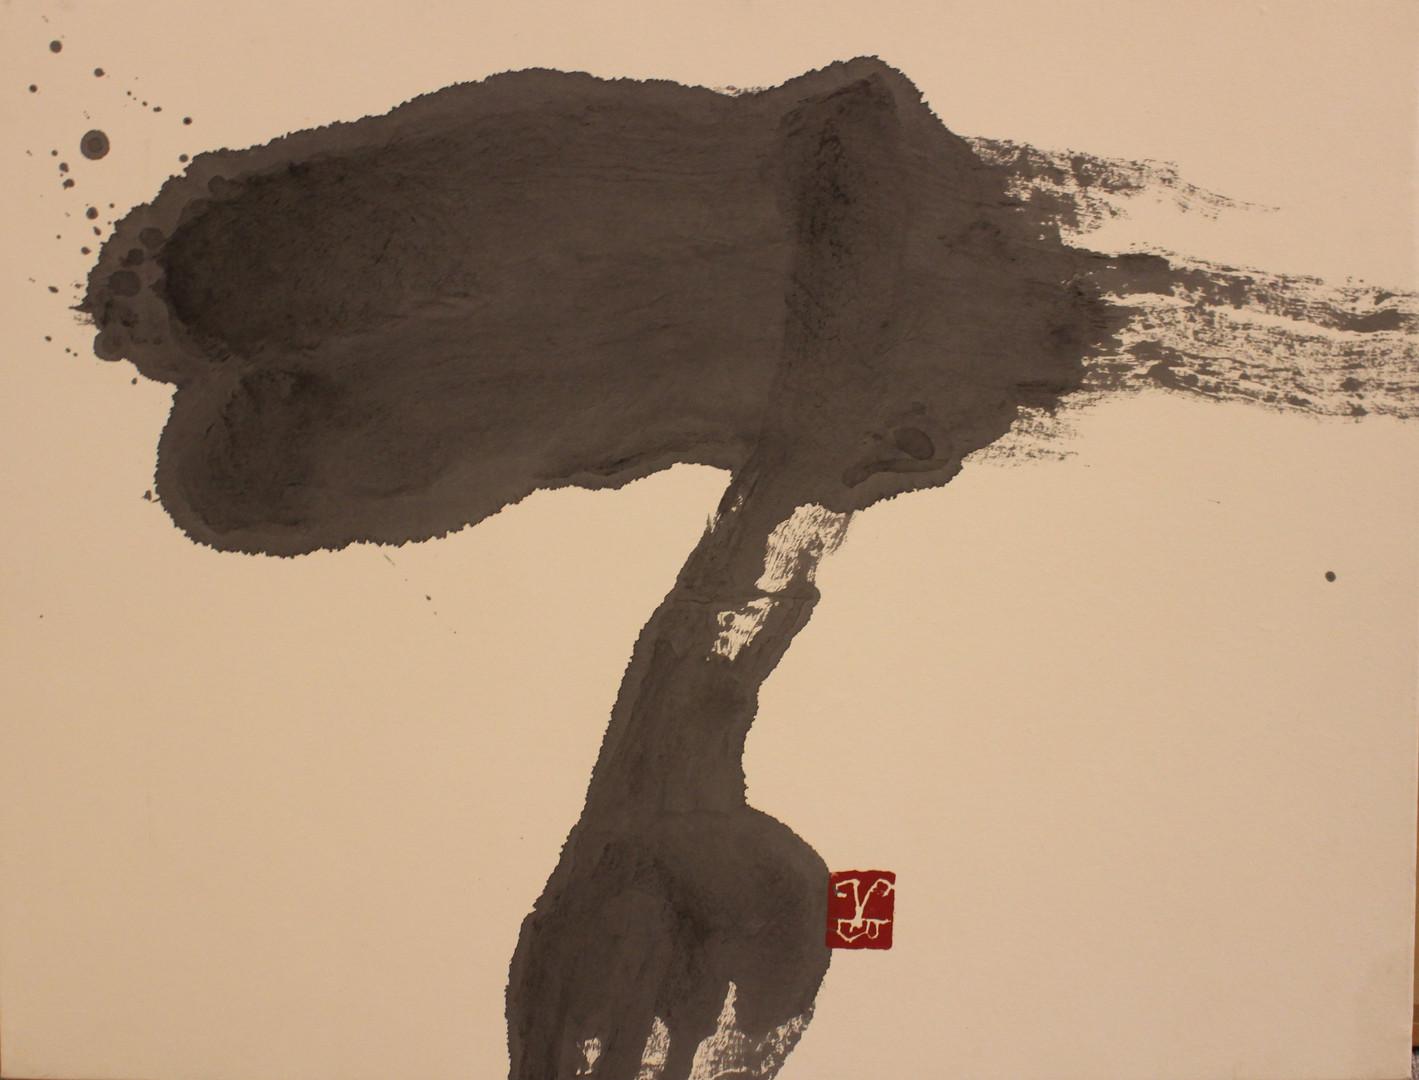 katadoru-te+1985+78x60cm+sumi+on+paper c